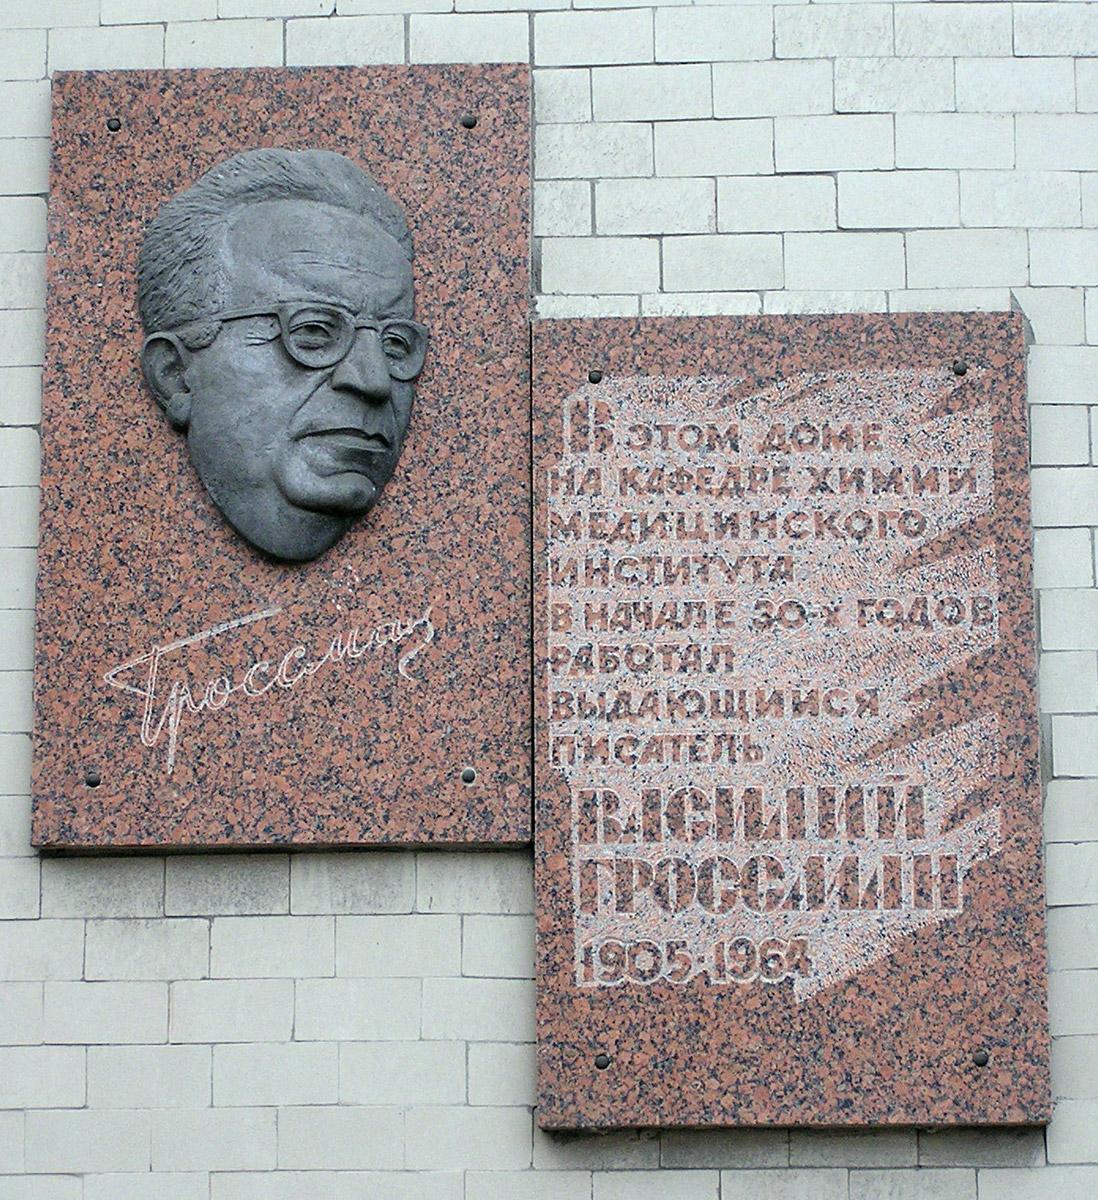 Wassili Semjonowitsch Grossman Wikipedia